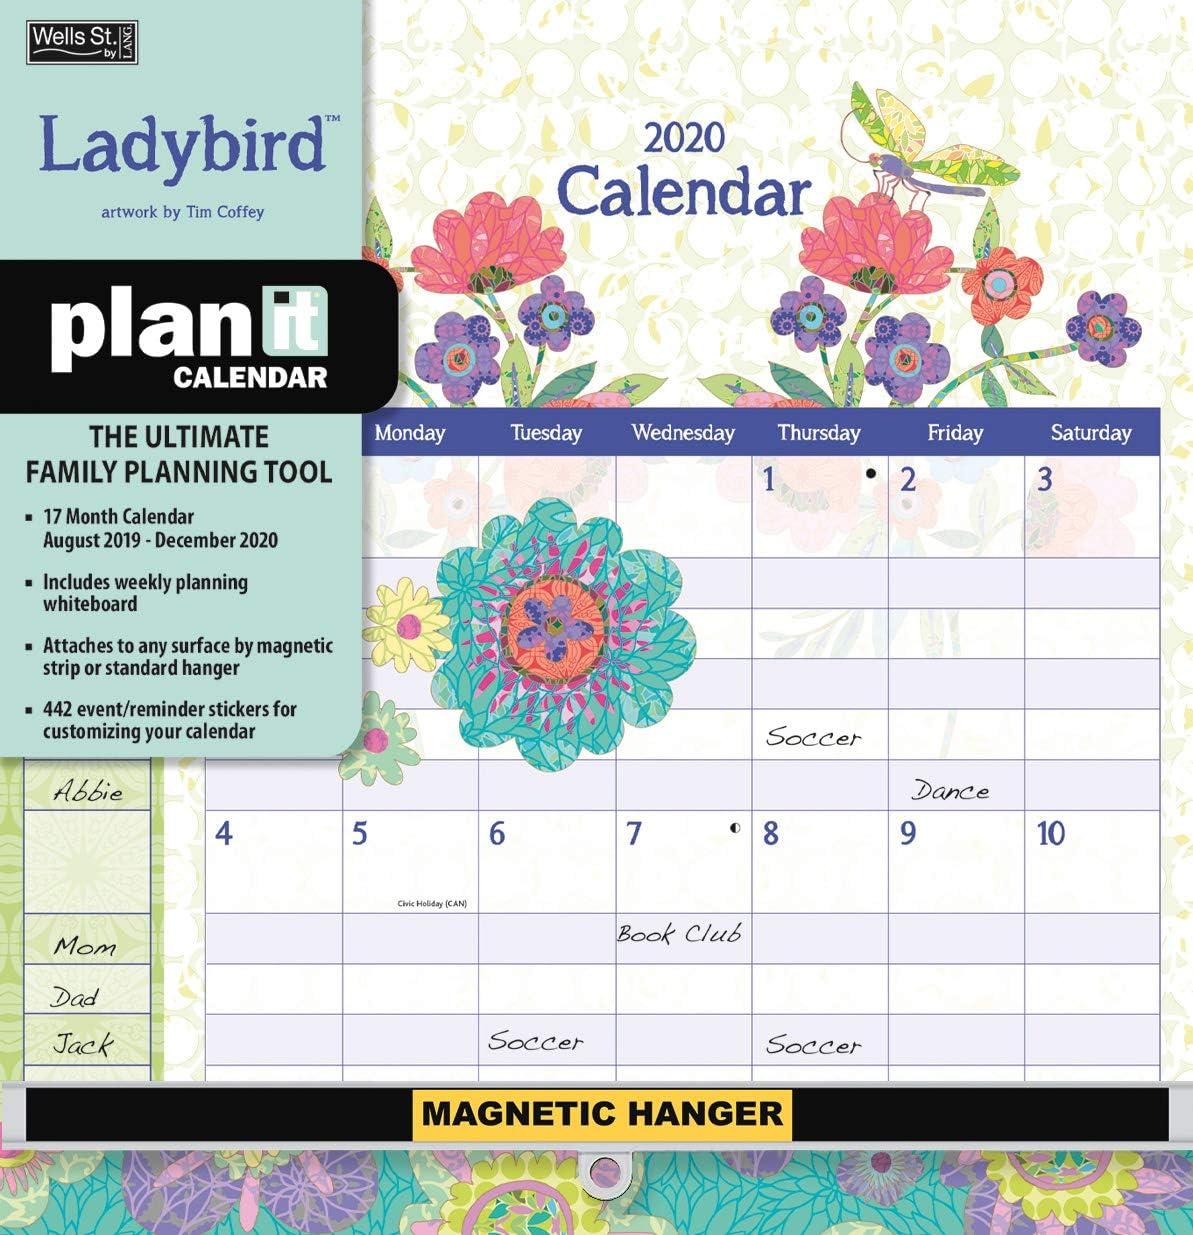 Wells Street by LANG WSBL Ladybird 2020 Plan-It Plus (20997009157) アカデミックウォールカレンダー (20997009157)